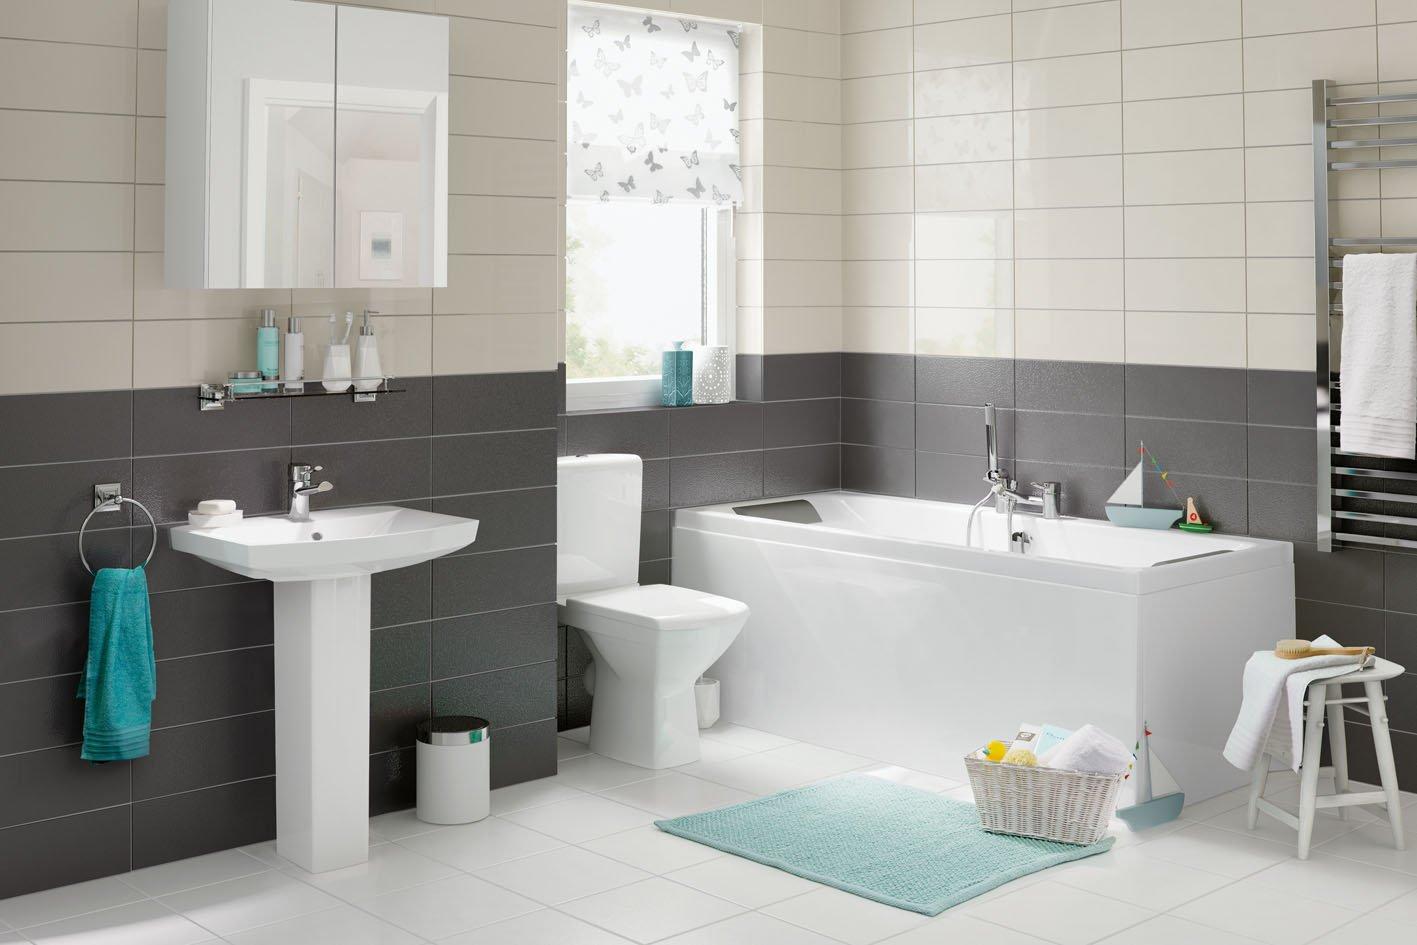 Baths, Toilets, Sinks & Taps